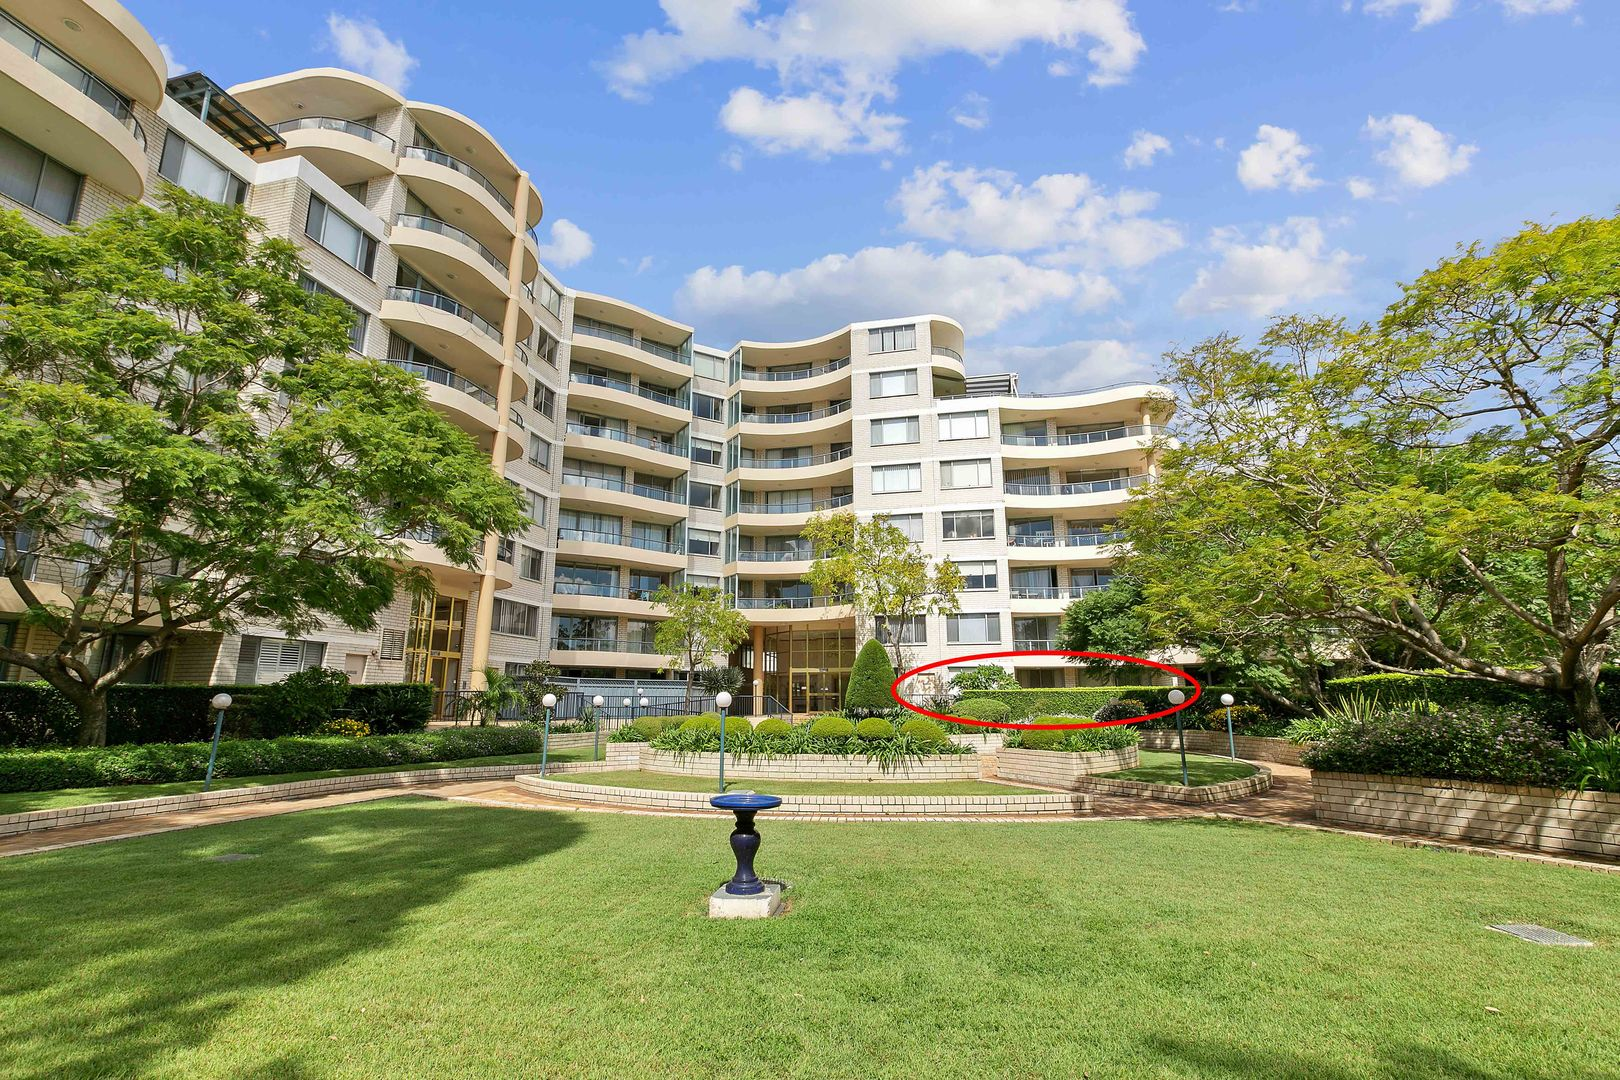 55/79-87 Boyce Road, Maroubra NSW 2035, Image 0